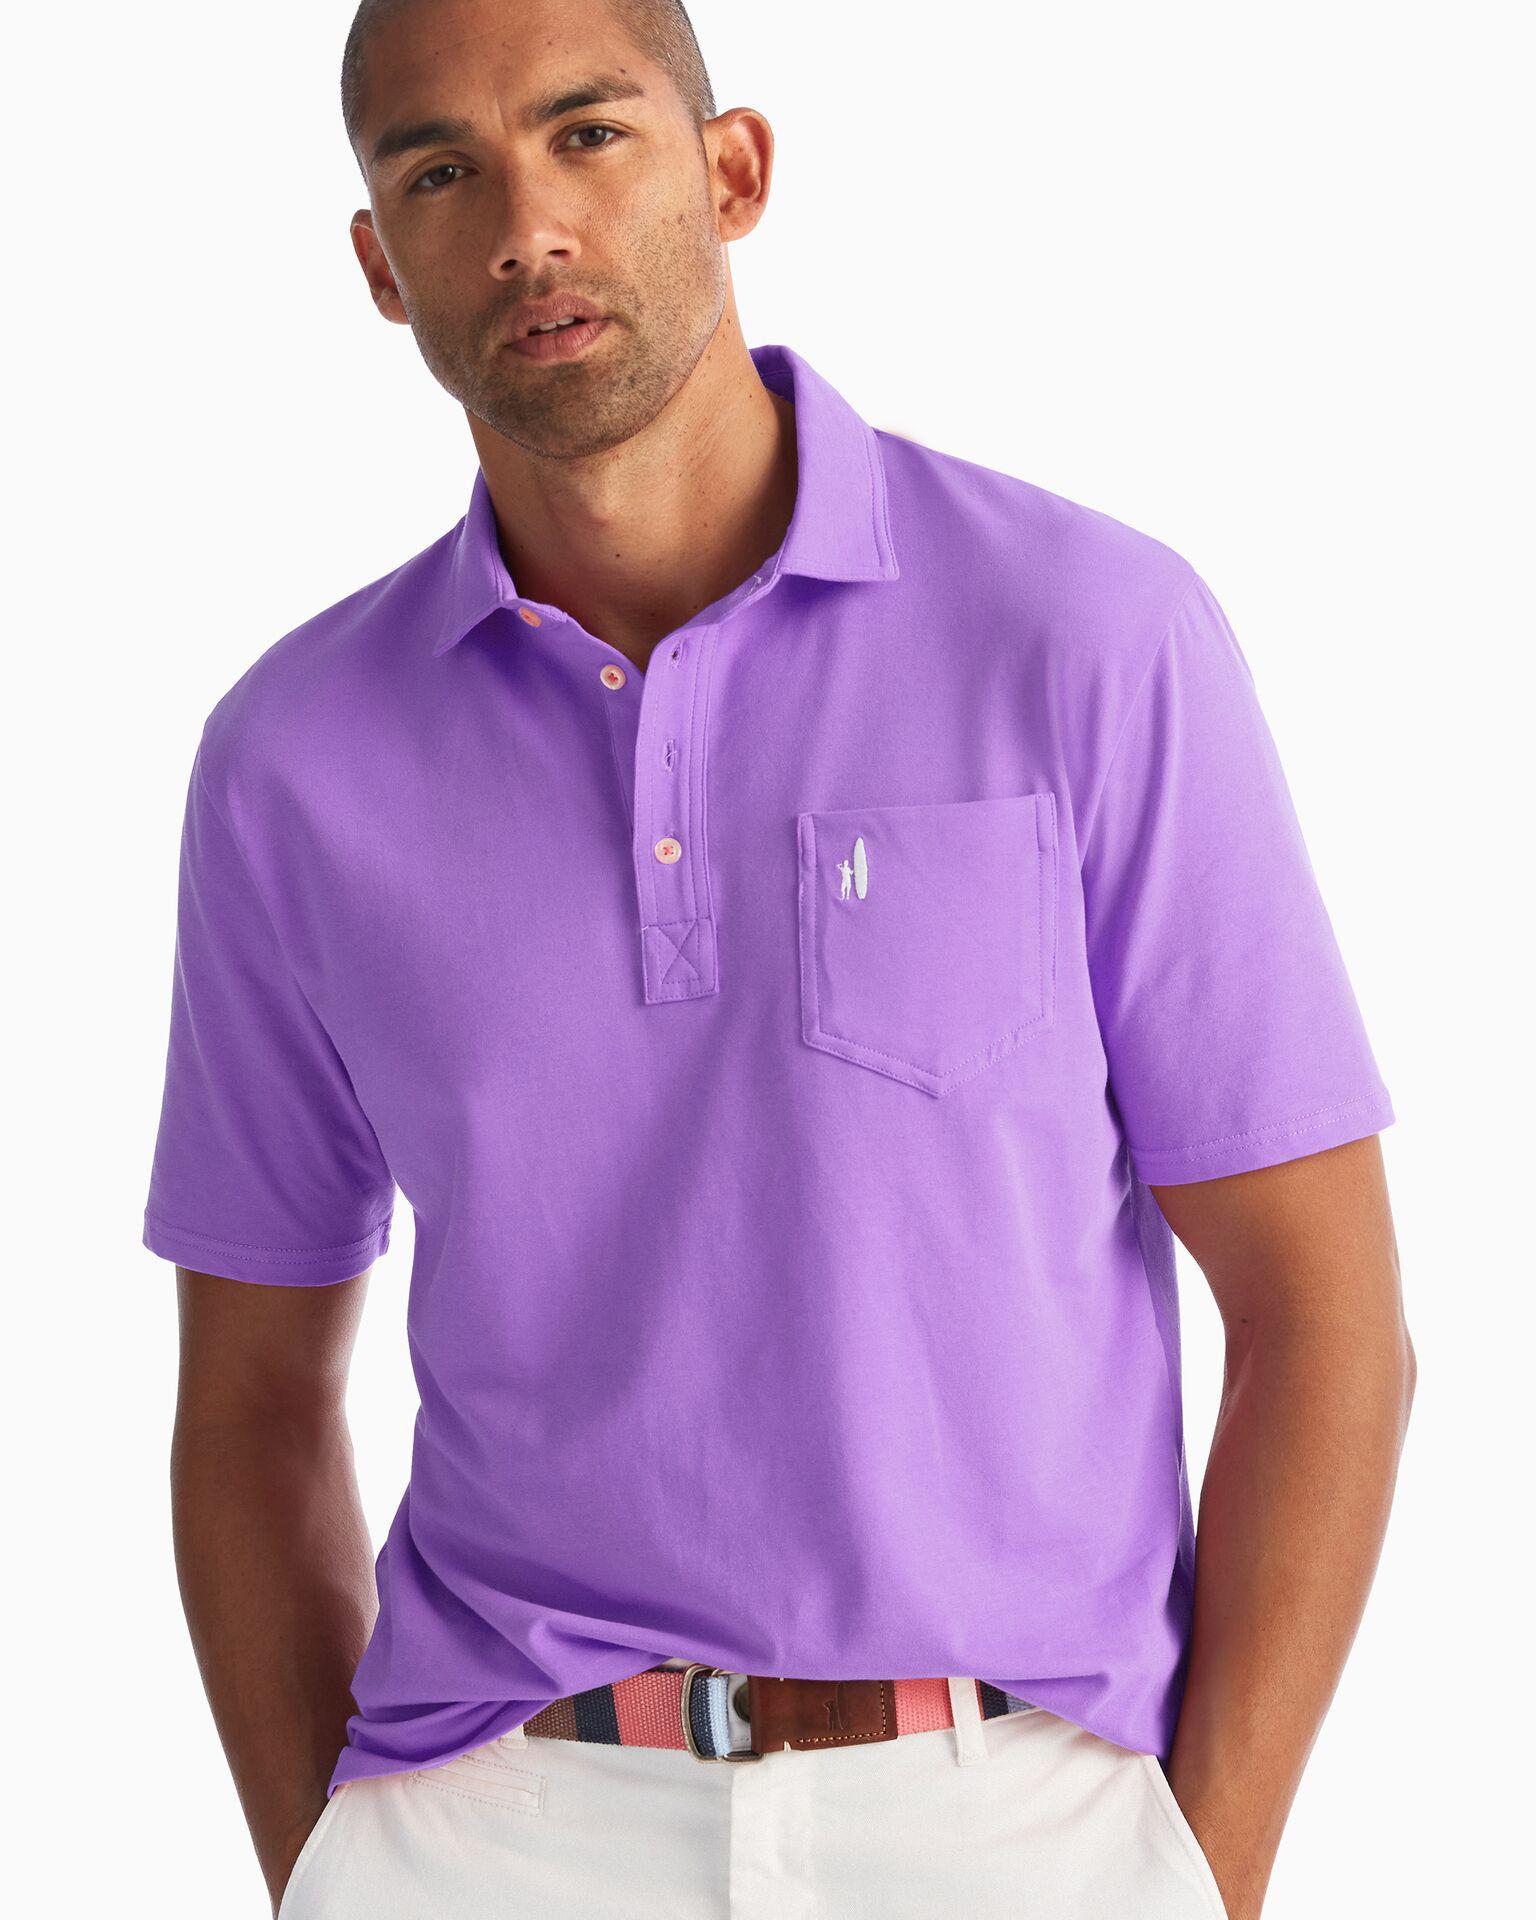 The Original 4-Button Polo (Lavender)